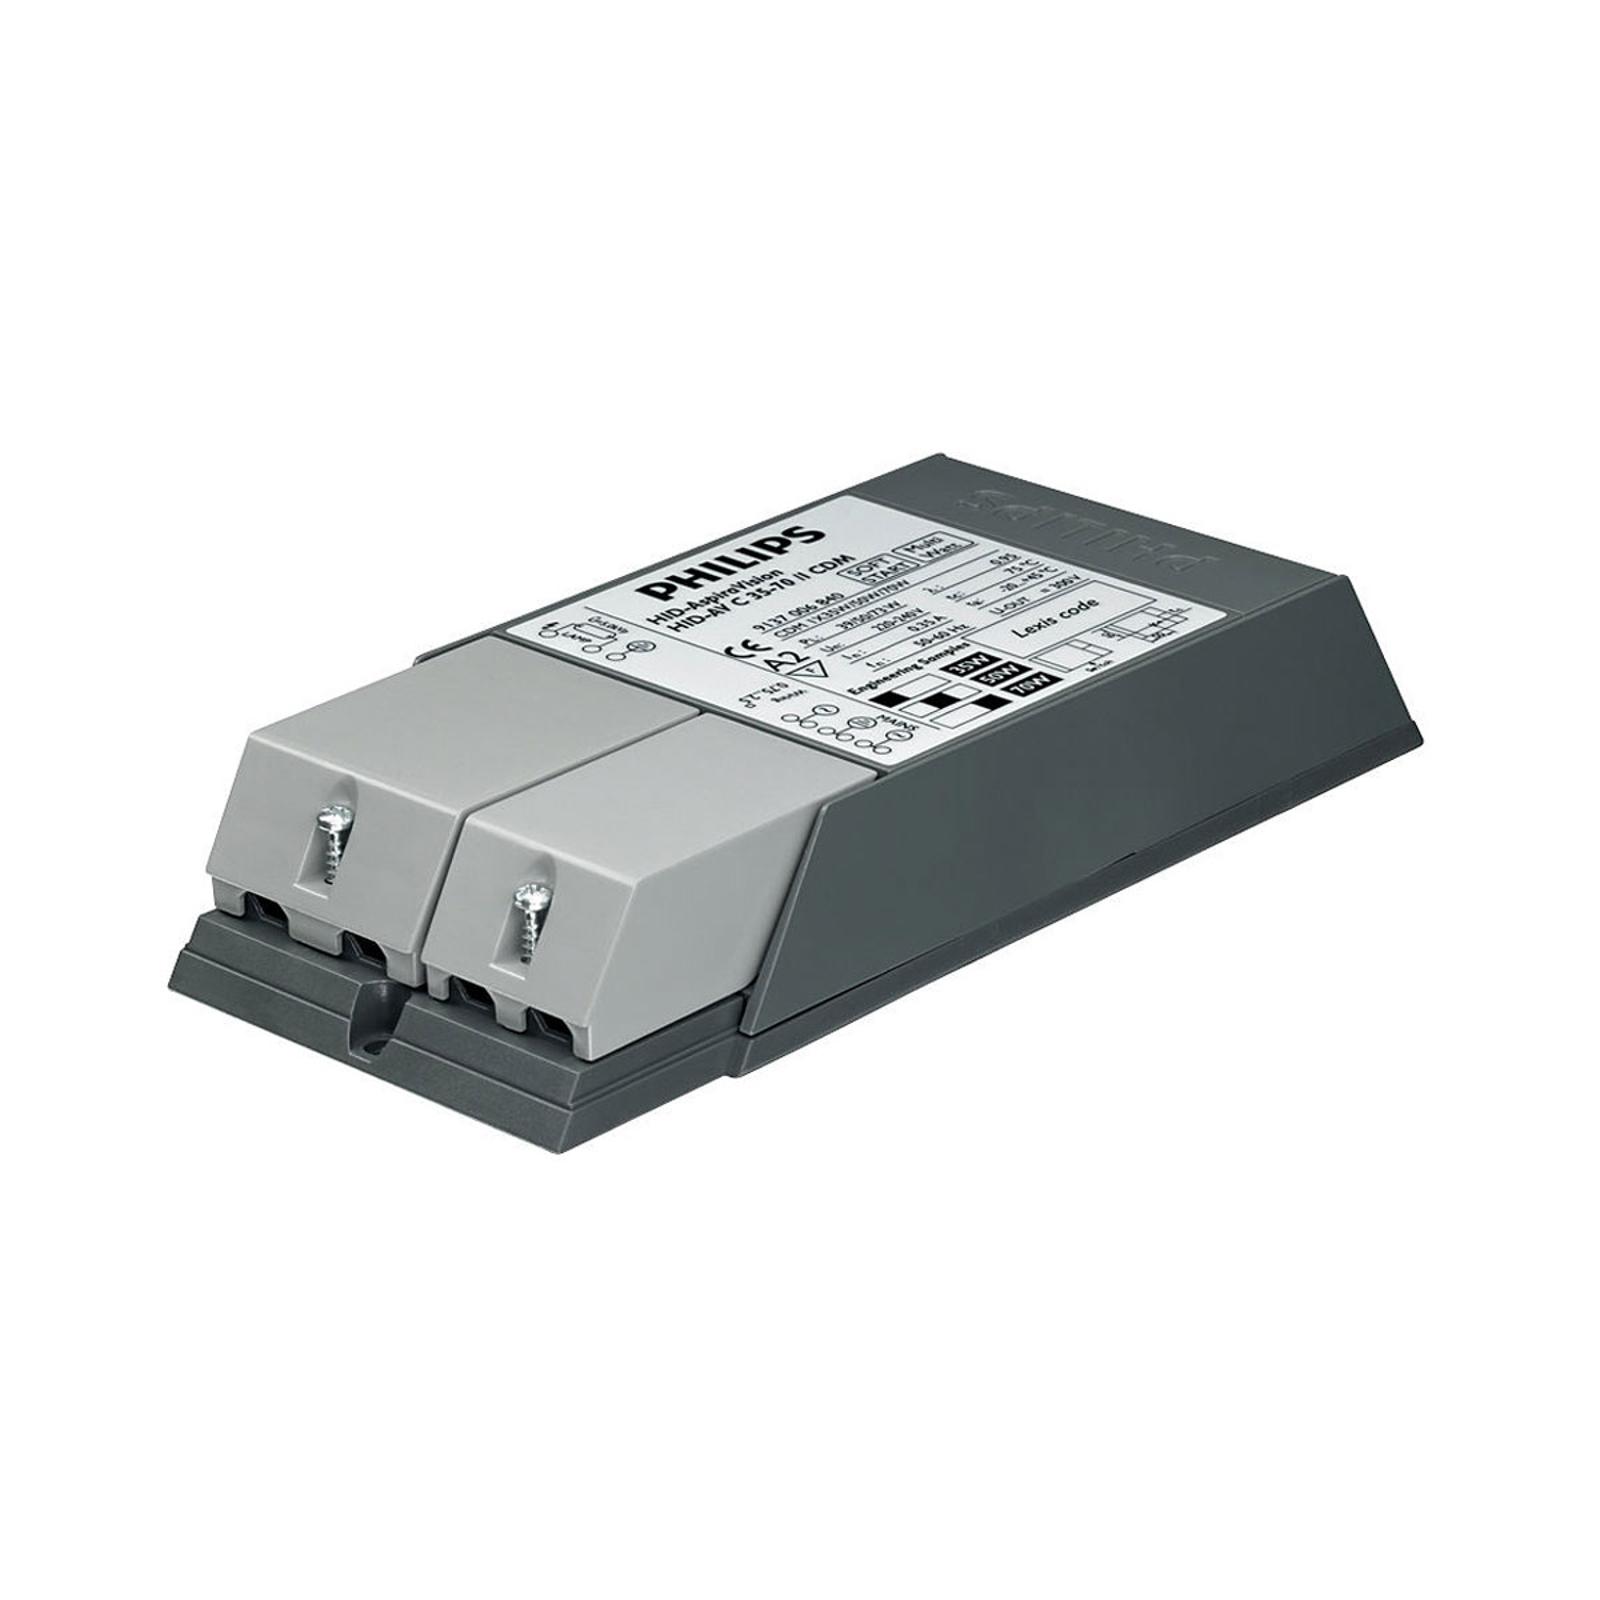 HID-AspiraVision Compact statecznik MW 35-70W